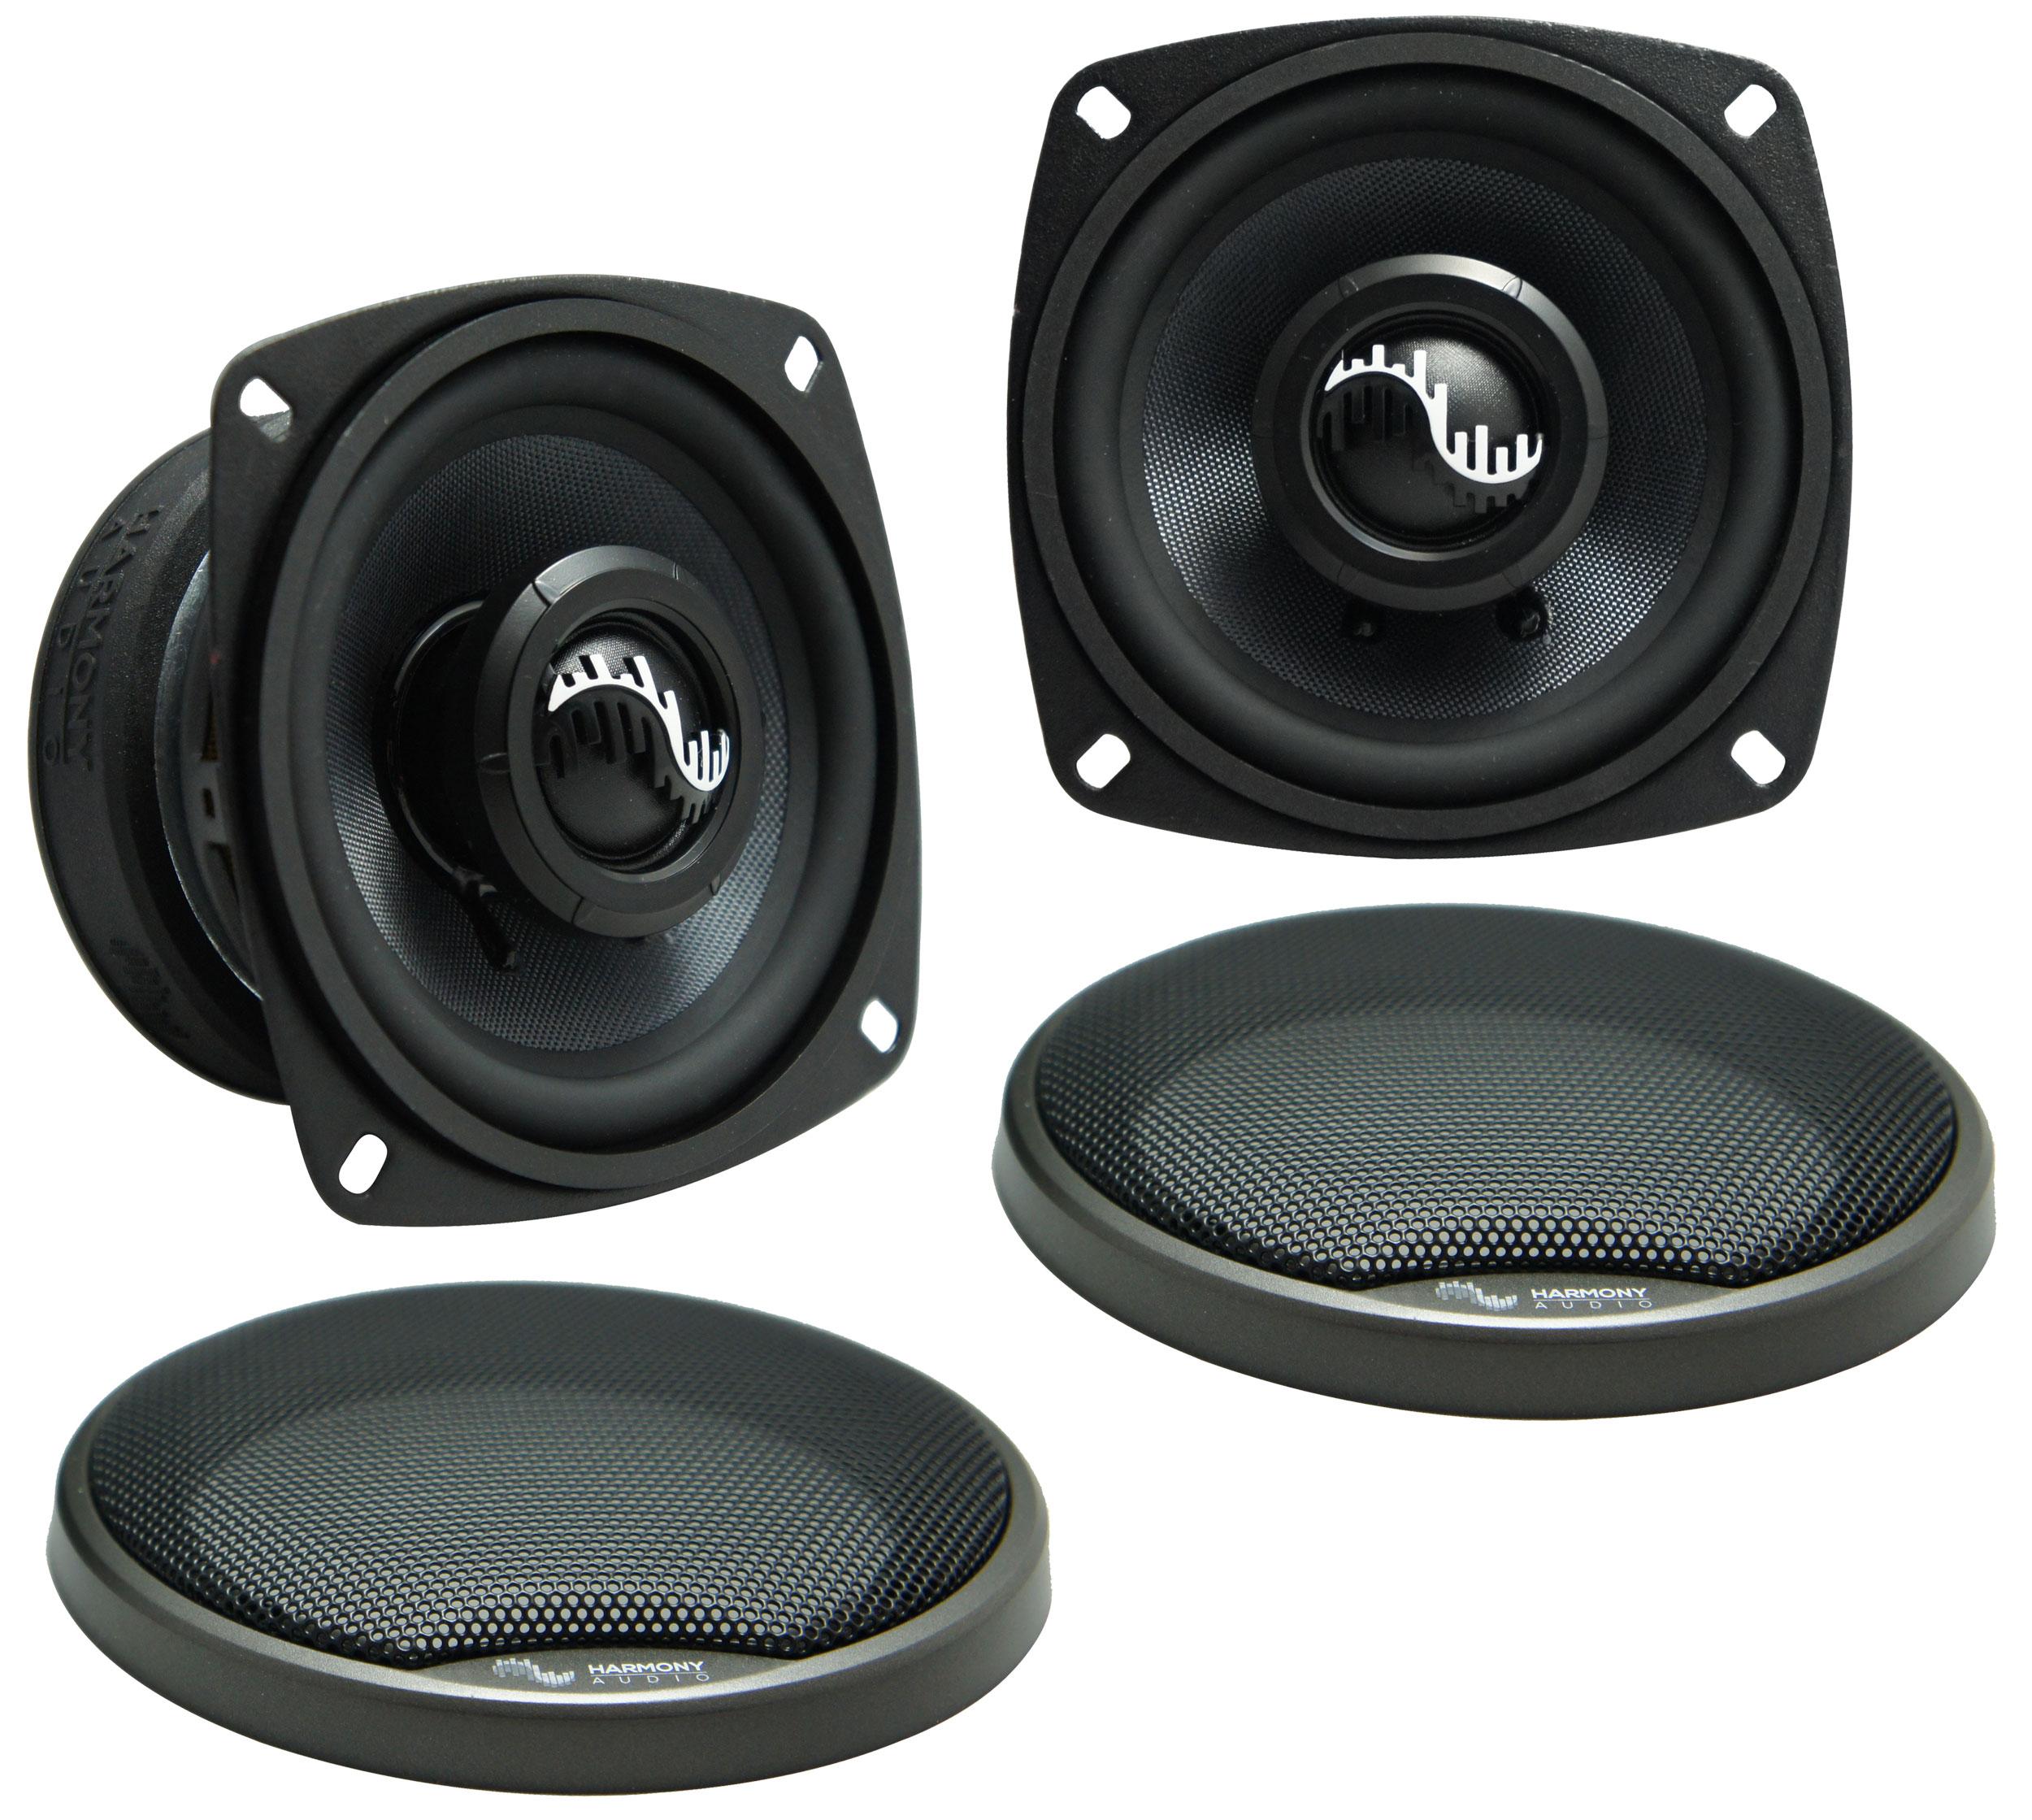 Fits Acura MDX 2007-2016 Rear Door Replacement Speaker Harmony HA-C4 Premium Speakers